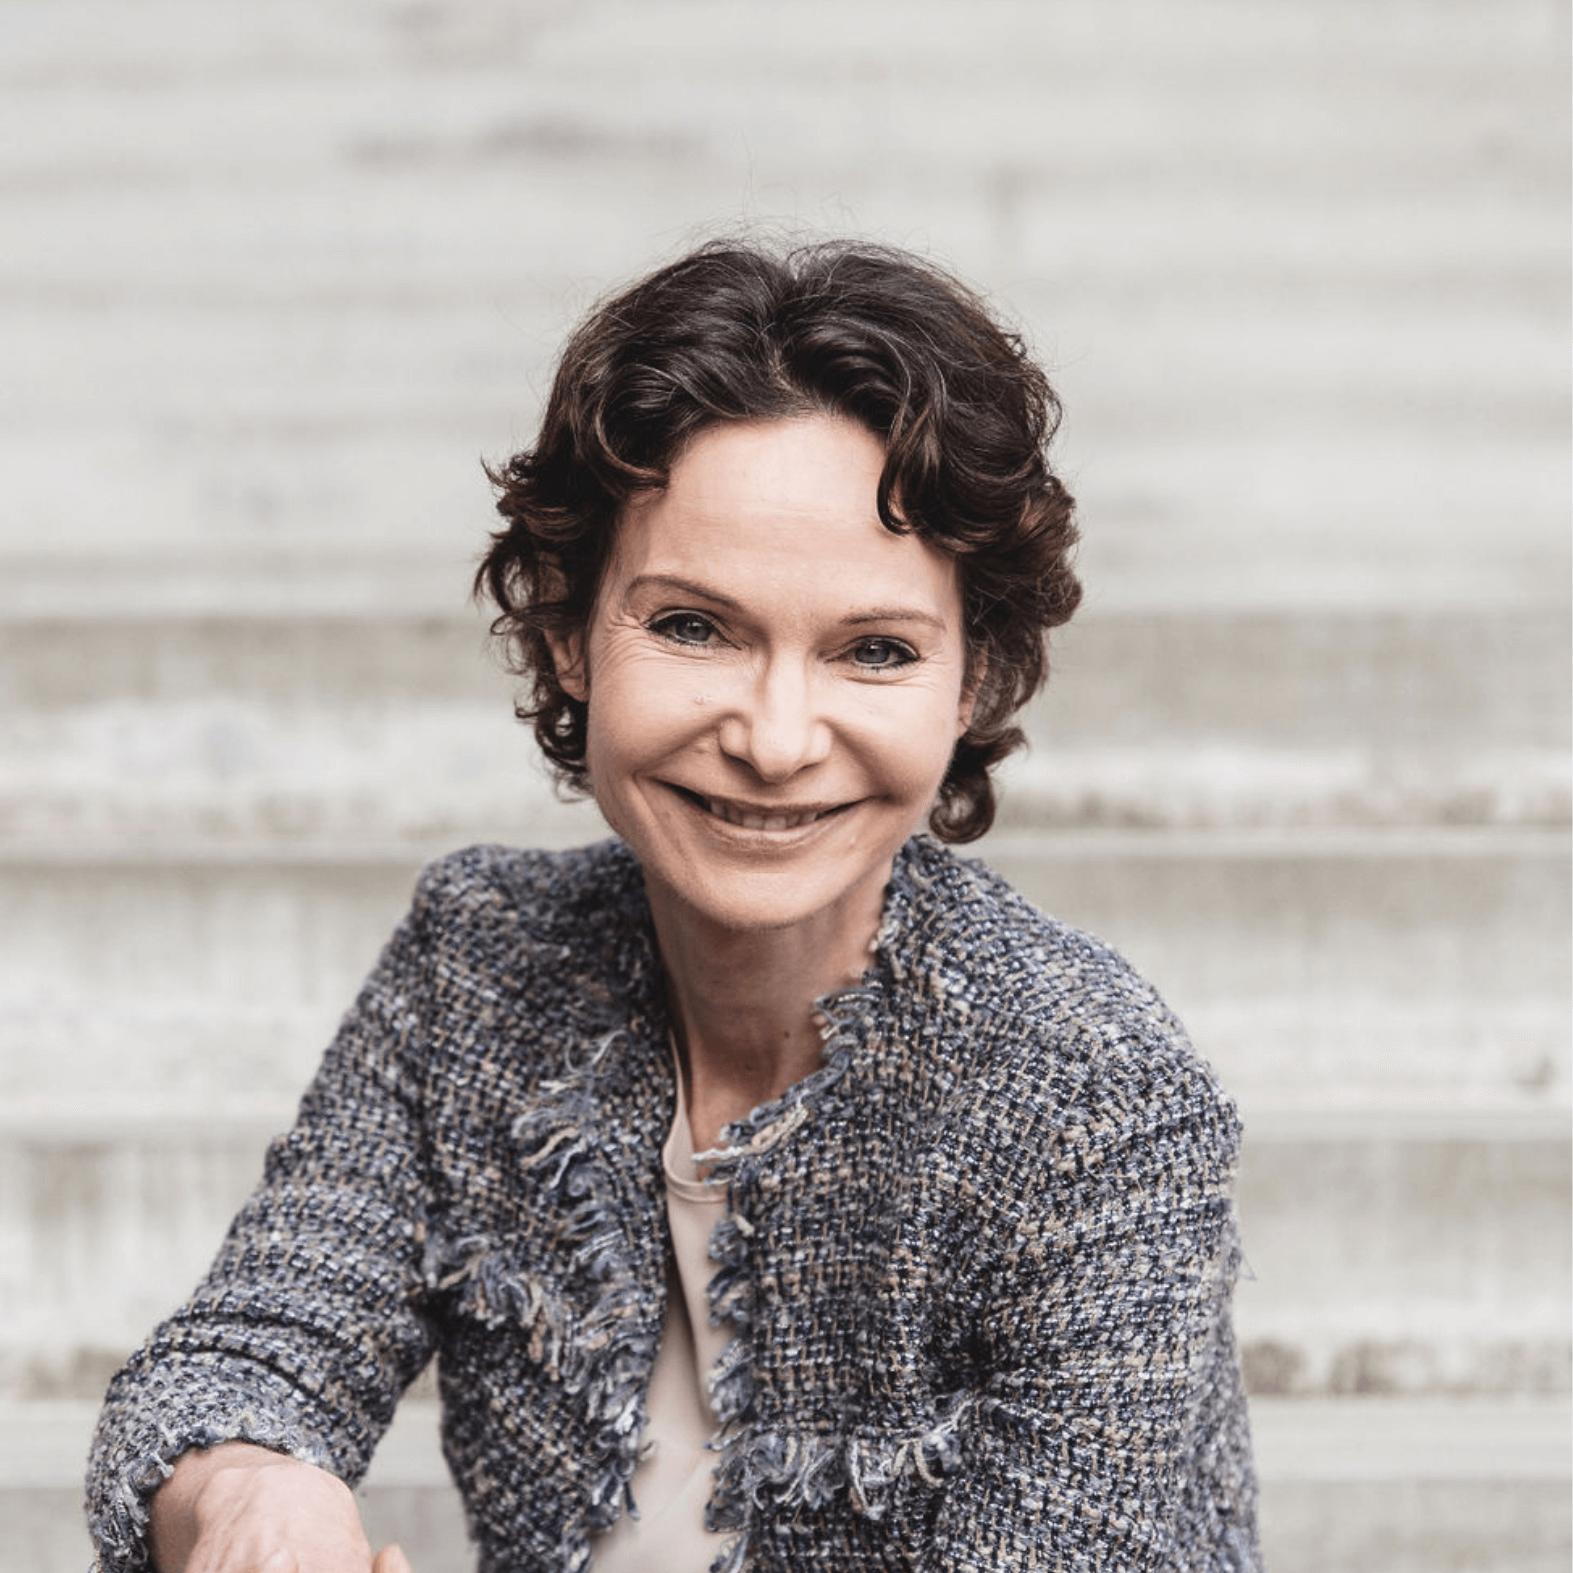 Bettina van Wylich-Muxoll